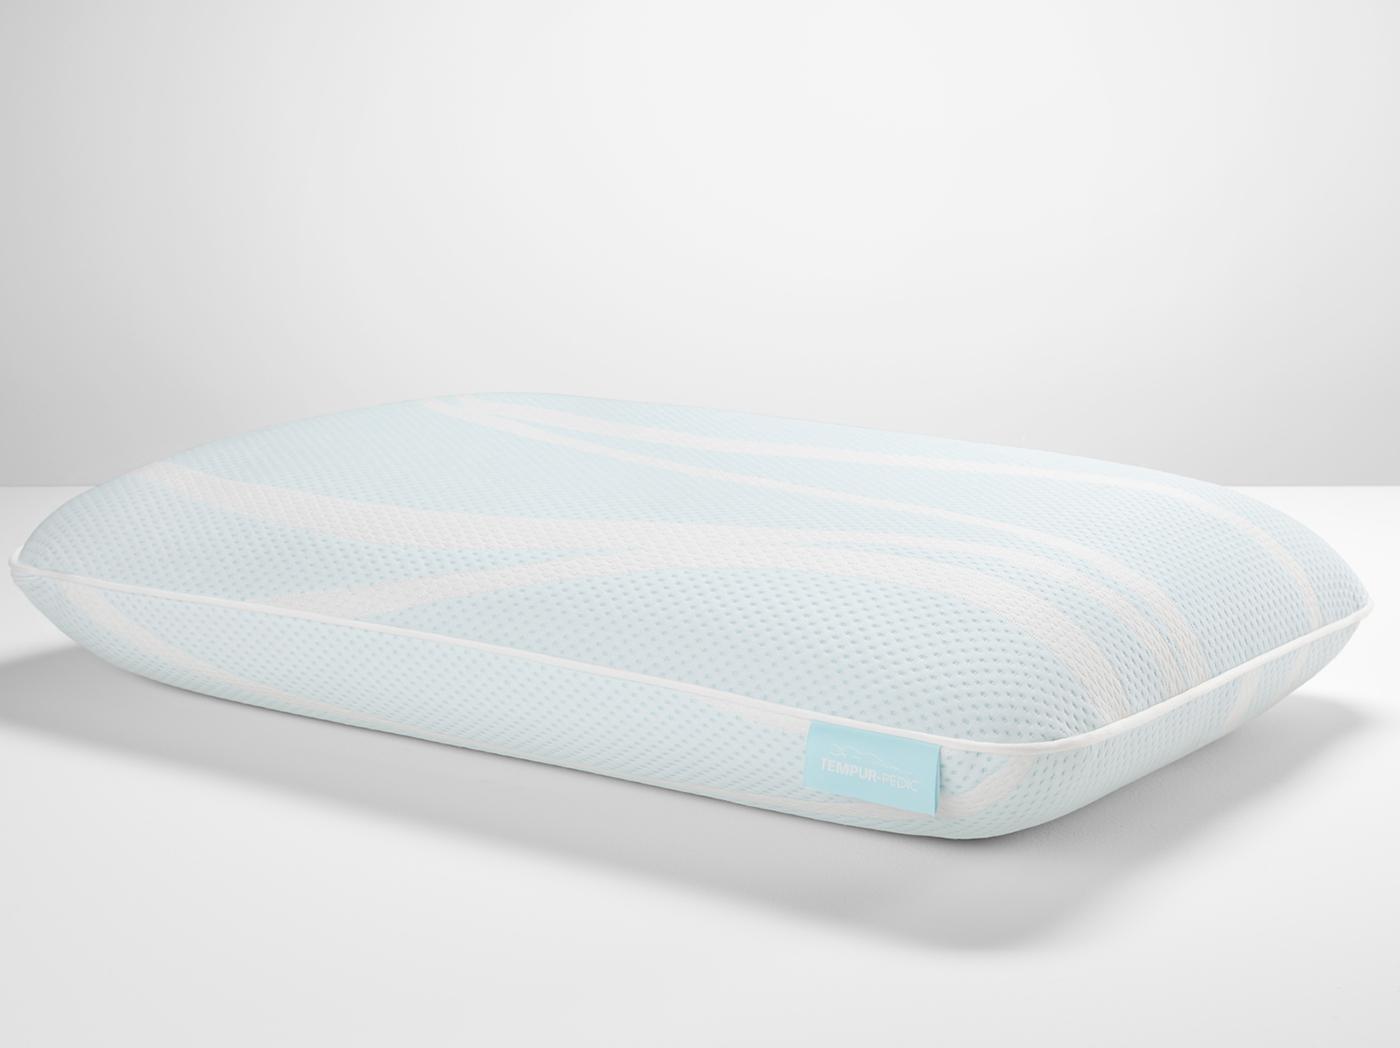 tempur breeze pro lo advanced cooling king pillow steinhafels